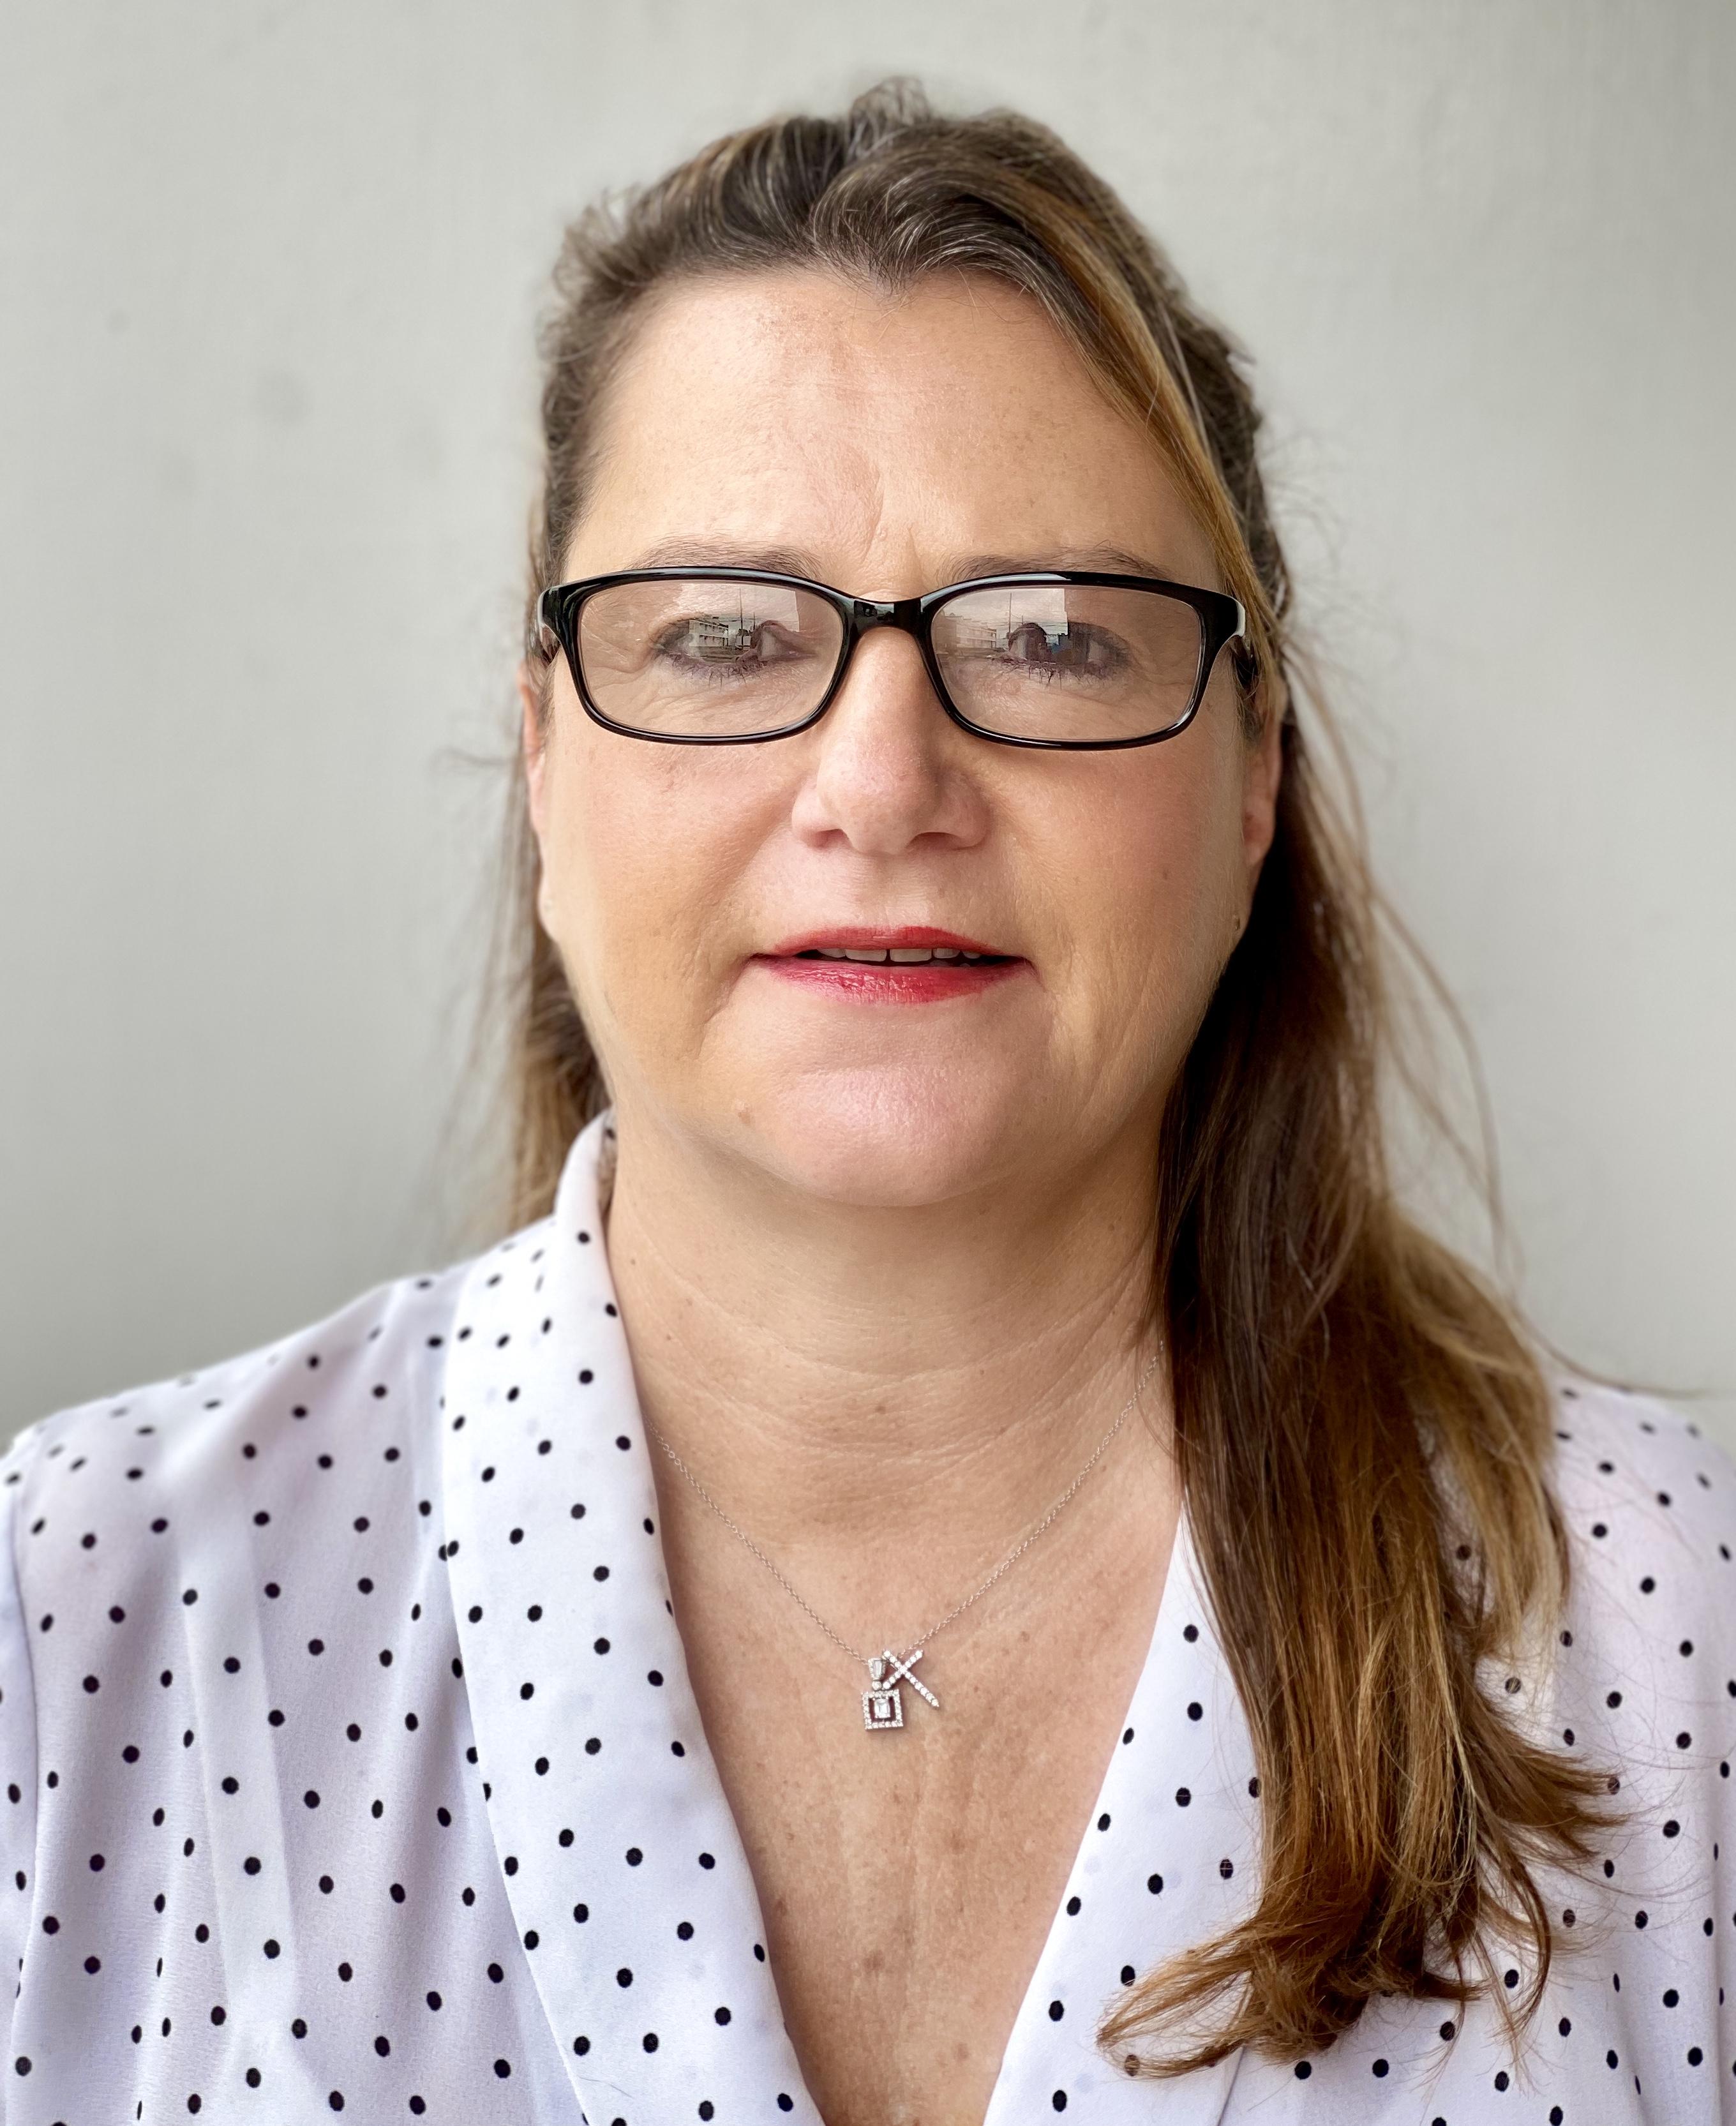 Profile picture of Neptune Society Funeral Director, Kelly E. Porte